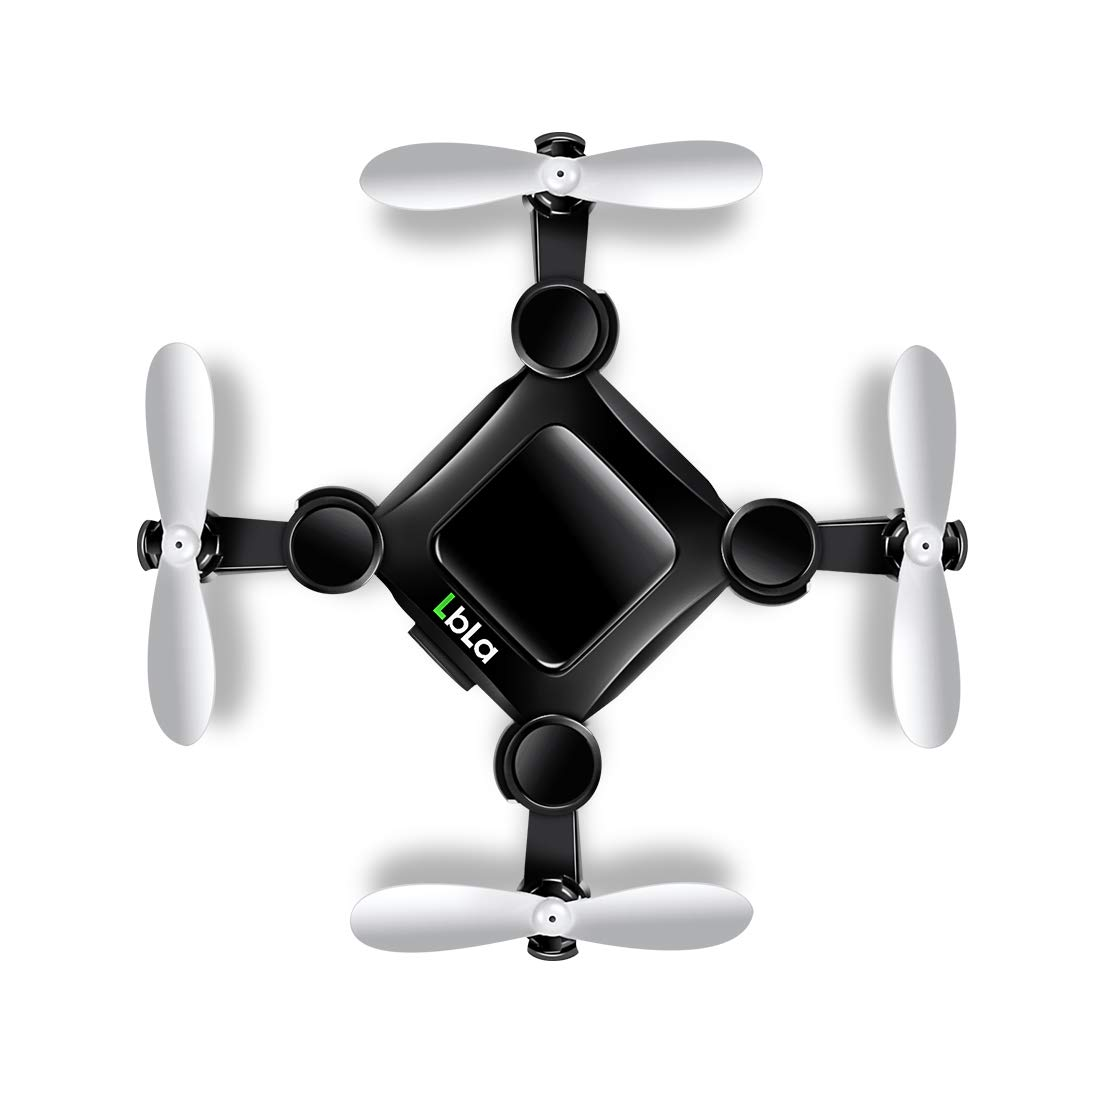 LBLA 3.7V 650mAh Battery for Drone WLH-12